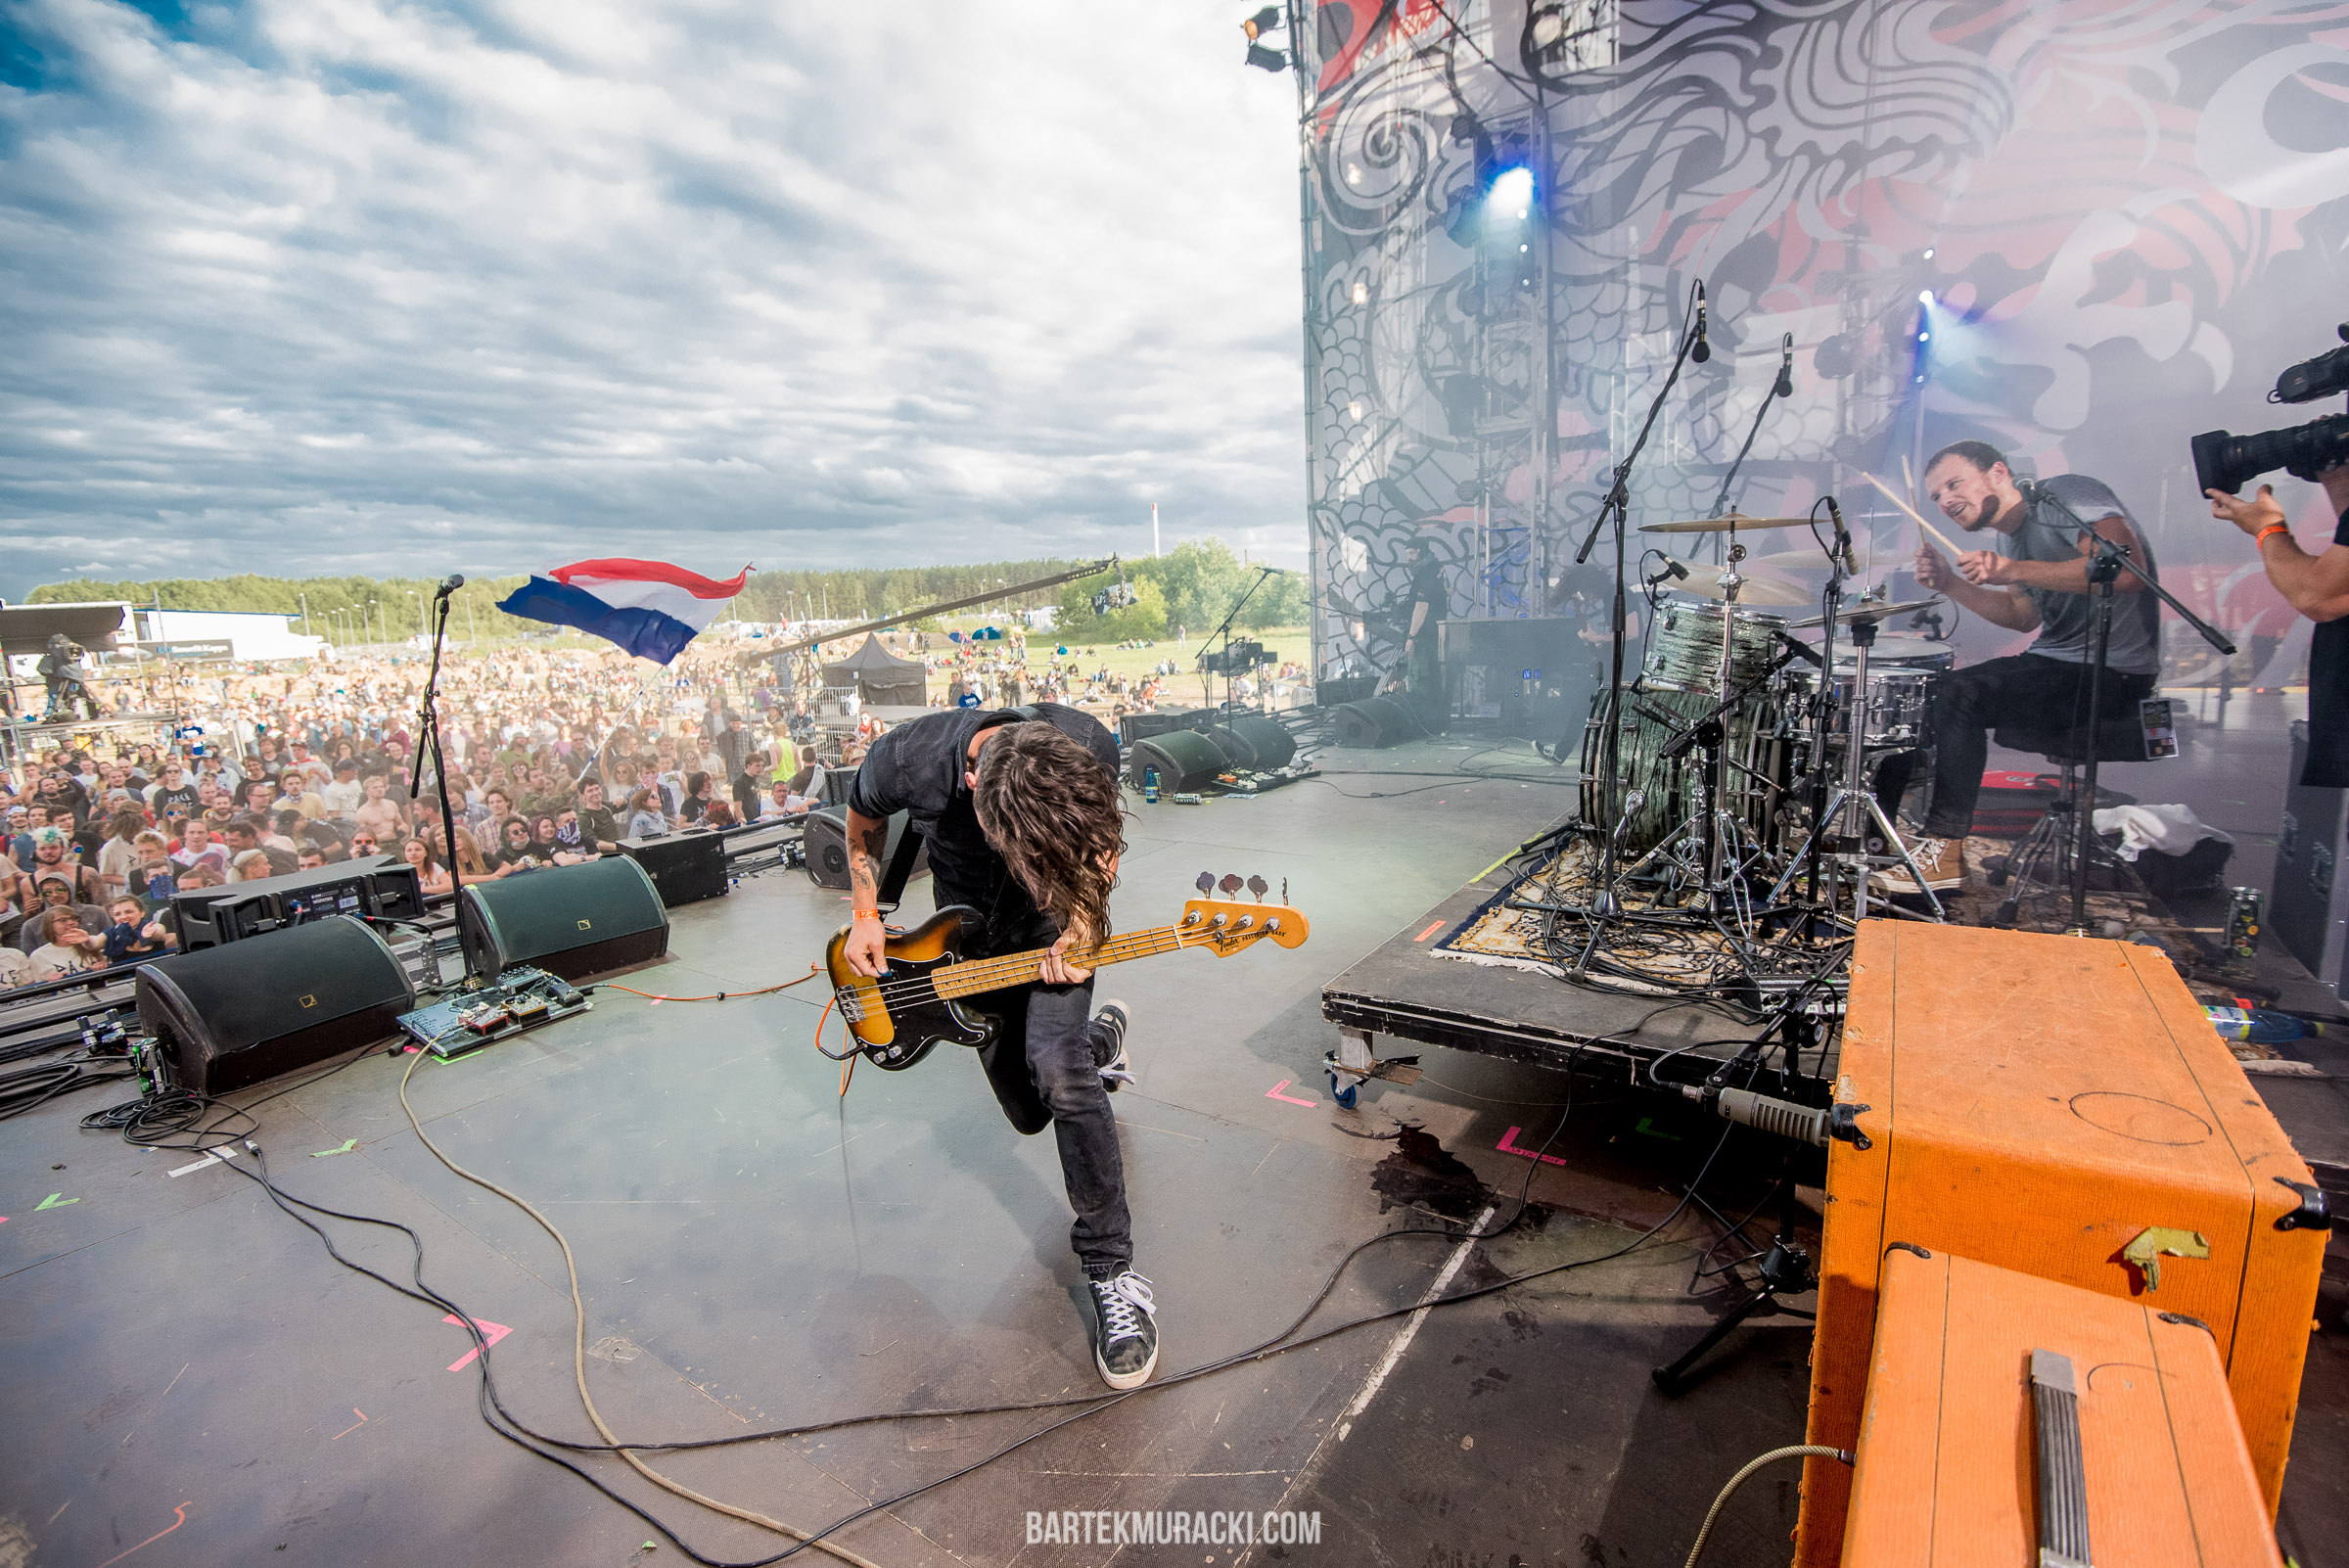 Koncerty-Przystanek-Woodstock-2015-photo-Bartek-Muracki-3762